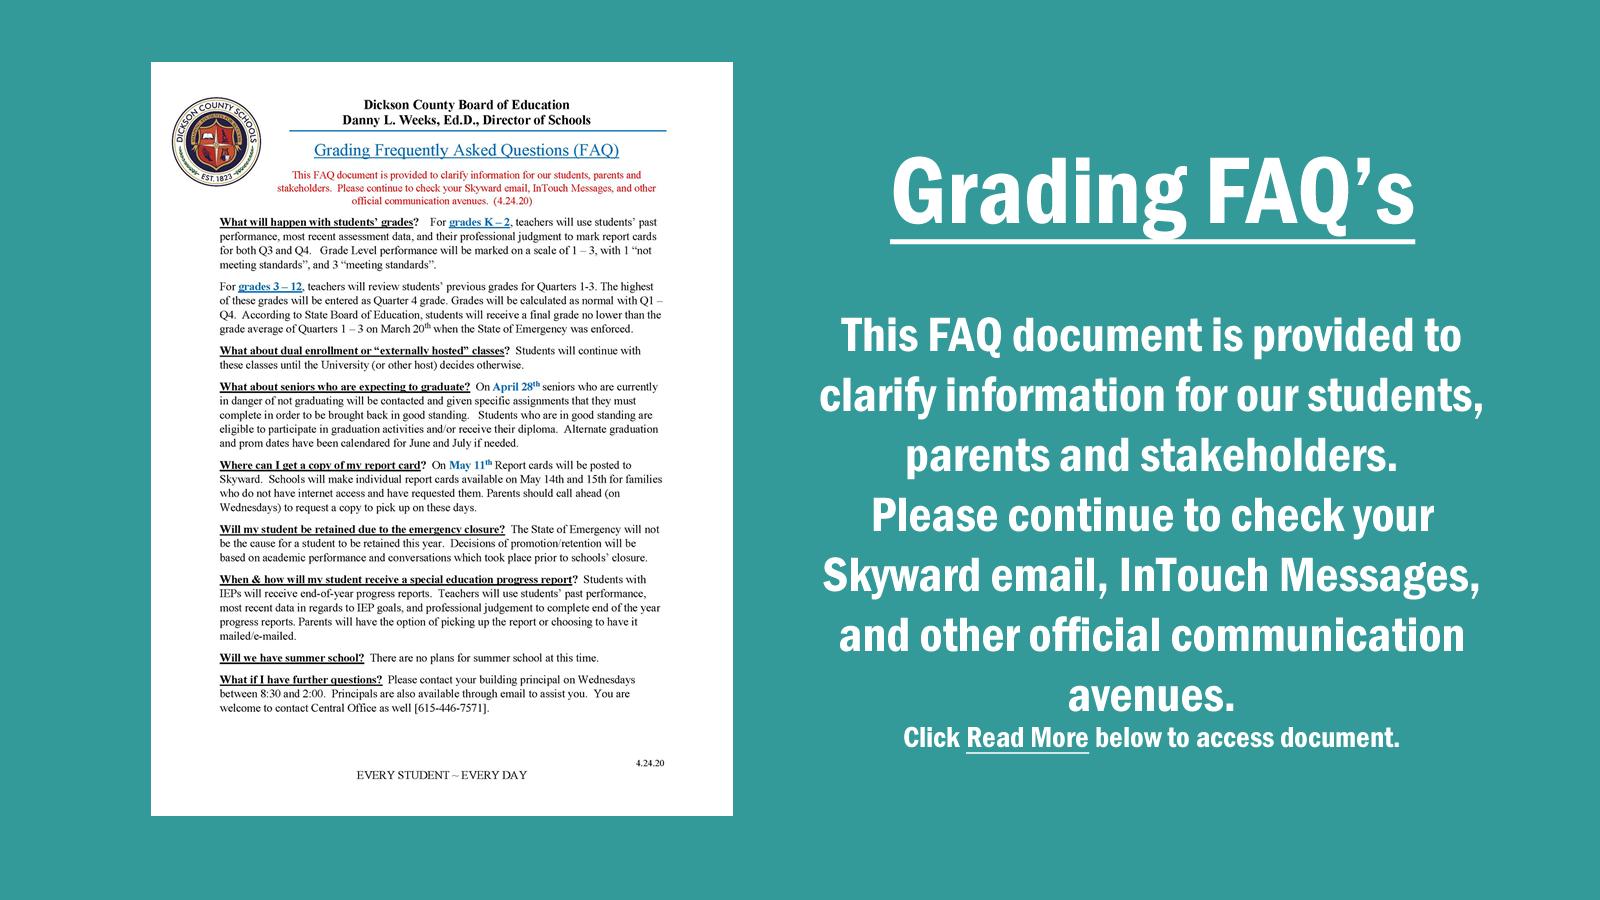 Grading FAQ's